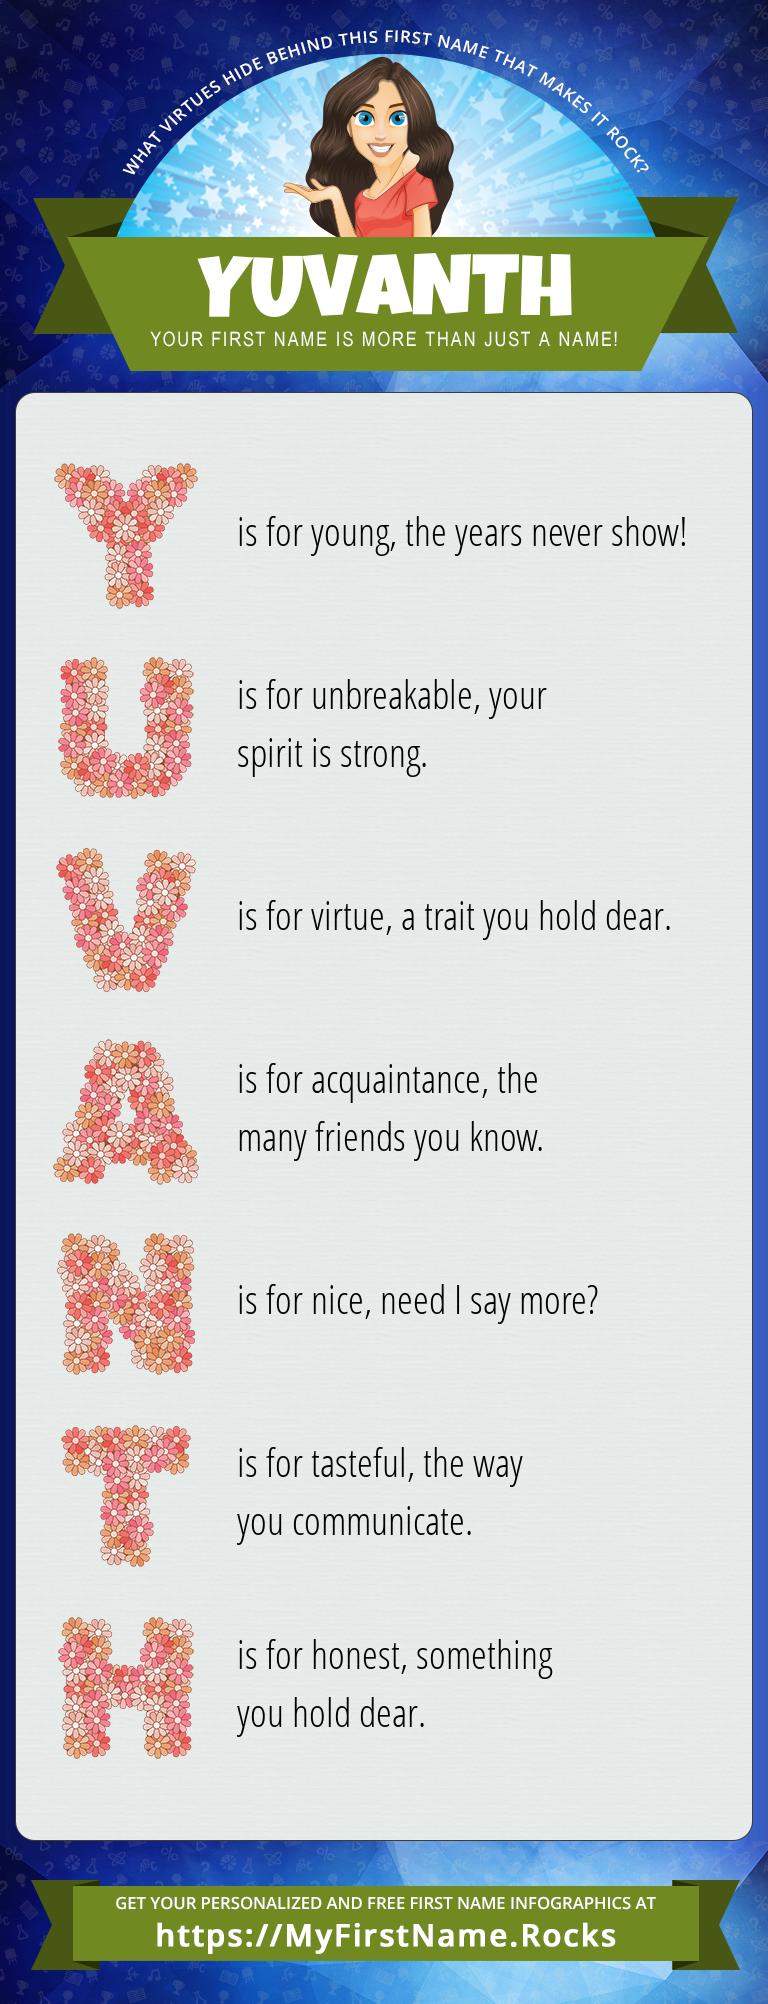 Yuvanth Infographics